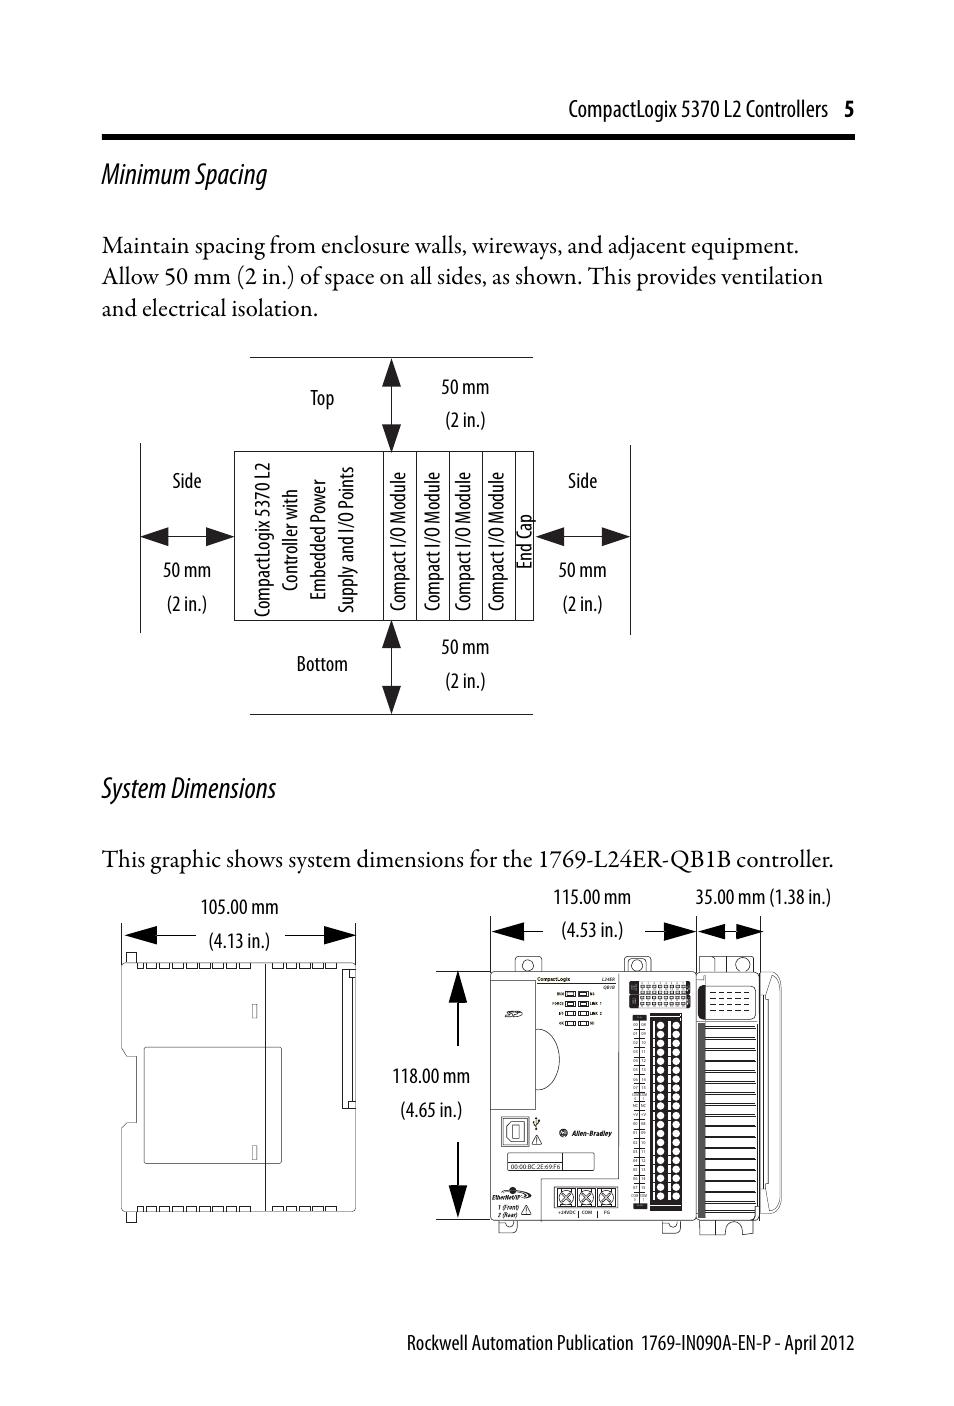 Minimum Spacing System Dimensions Rockwell Automation 1769 L24er Qb1b Qbfc1b Qbfc1b Compactlogix 5370 L2 Controllers Installation Instructions User Manual Page 5 16 Original Mode